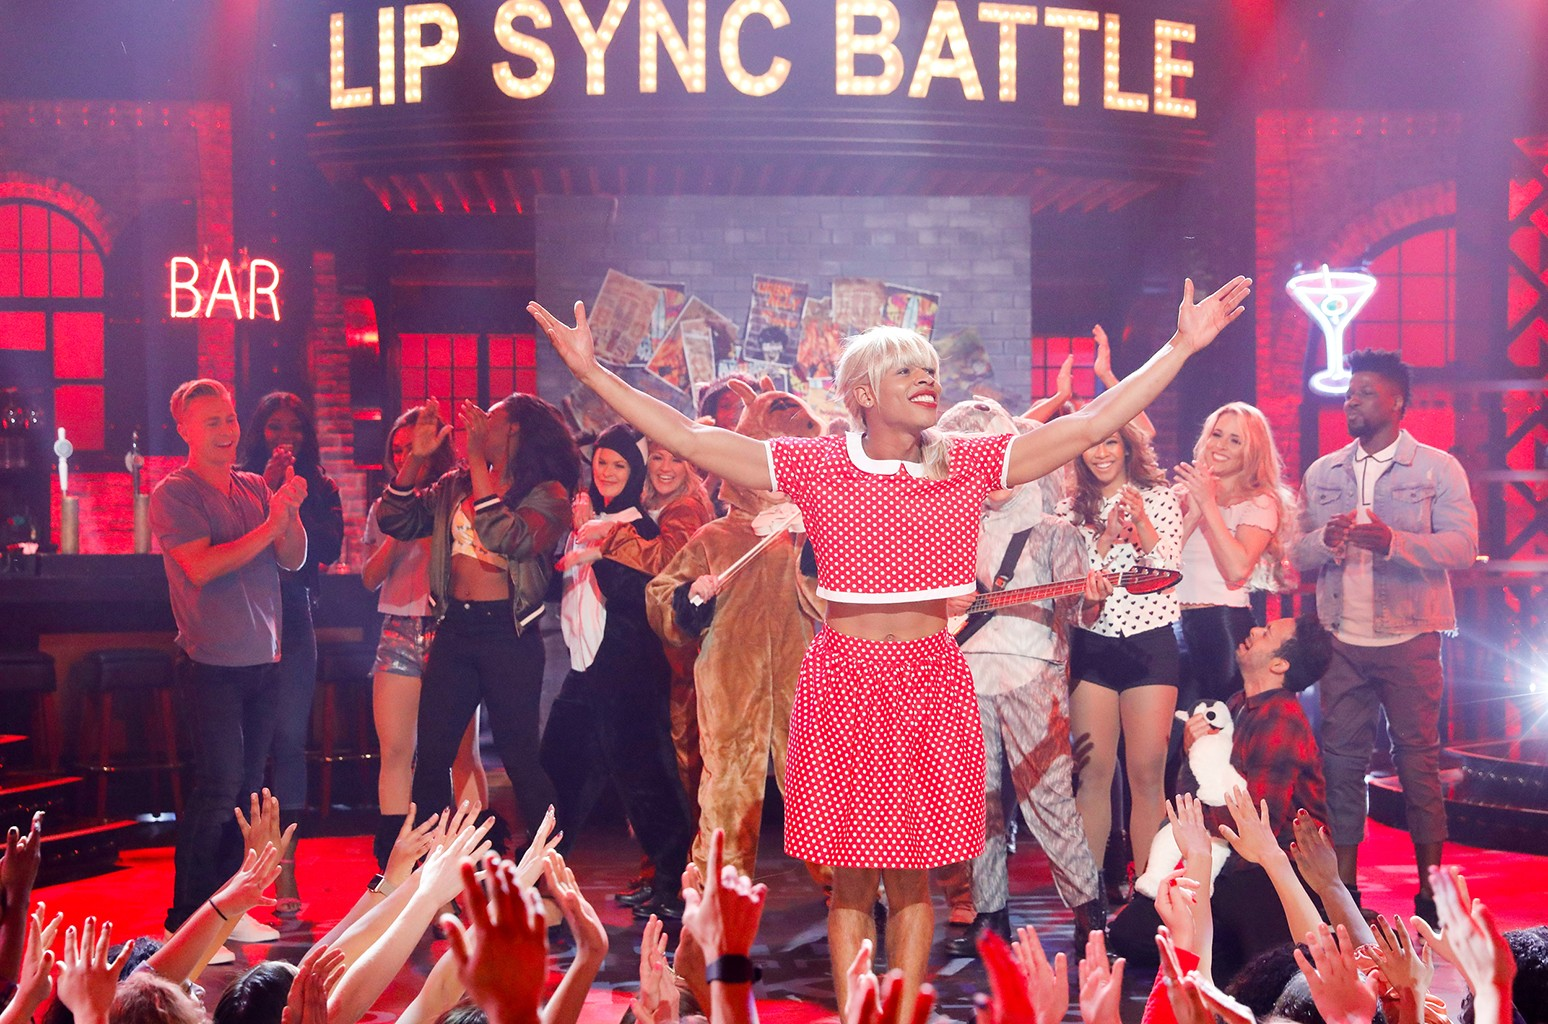 Bryshere Gray on Spike TV's Lip Sync Battle